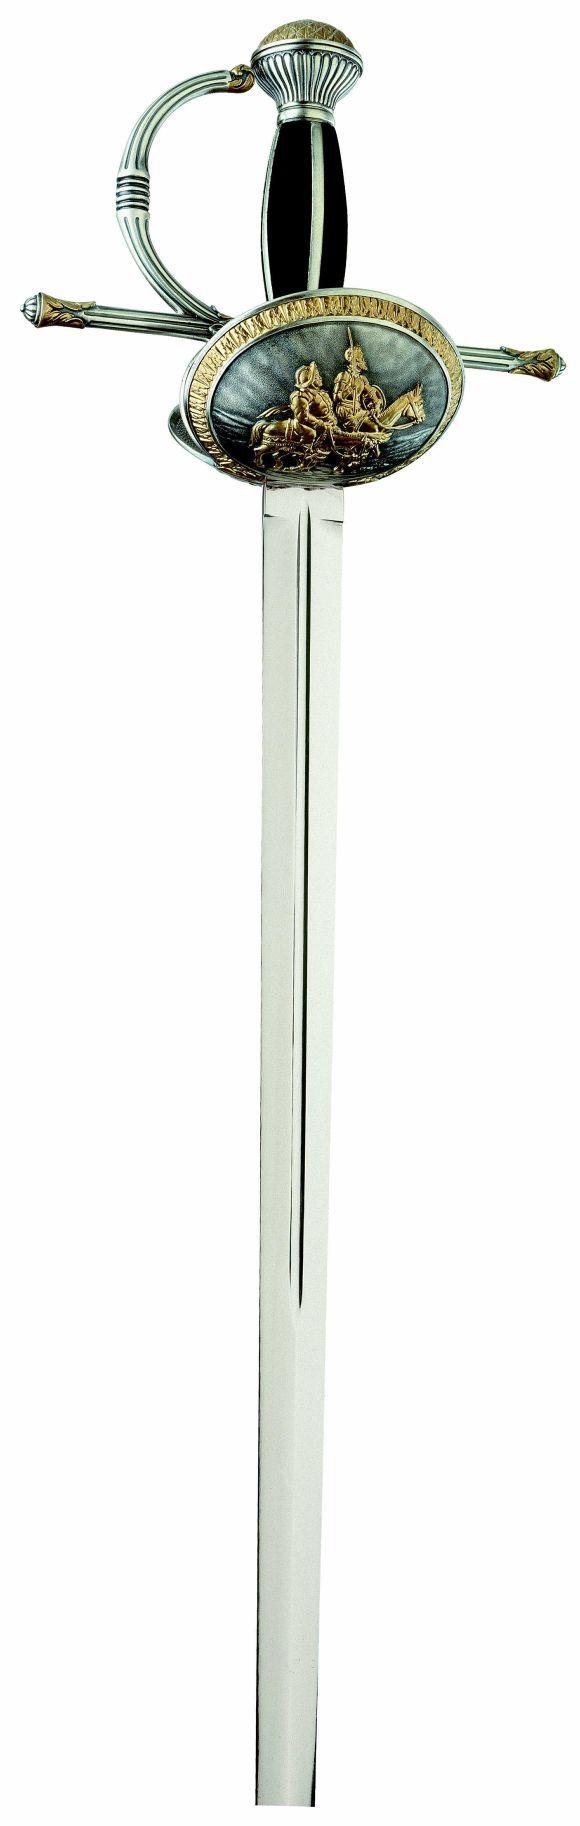 # 750 Don Quixote Clam Shell Hilt Rapier Sword by Marto of Toledo Spain